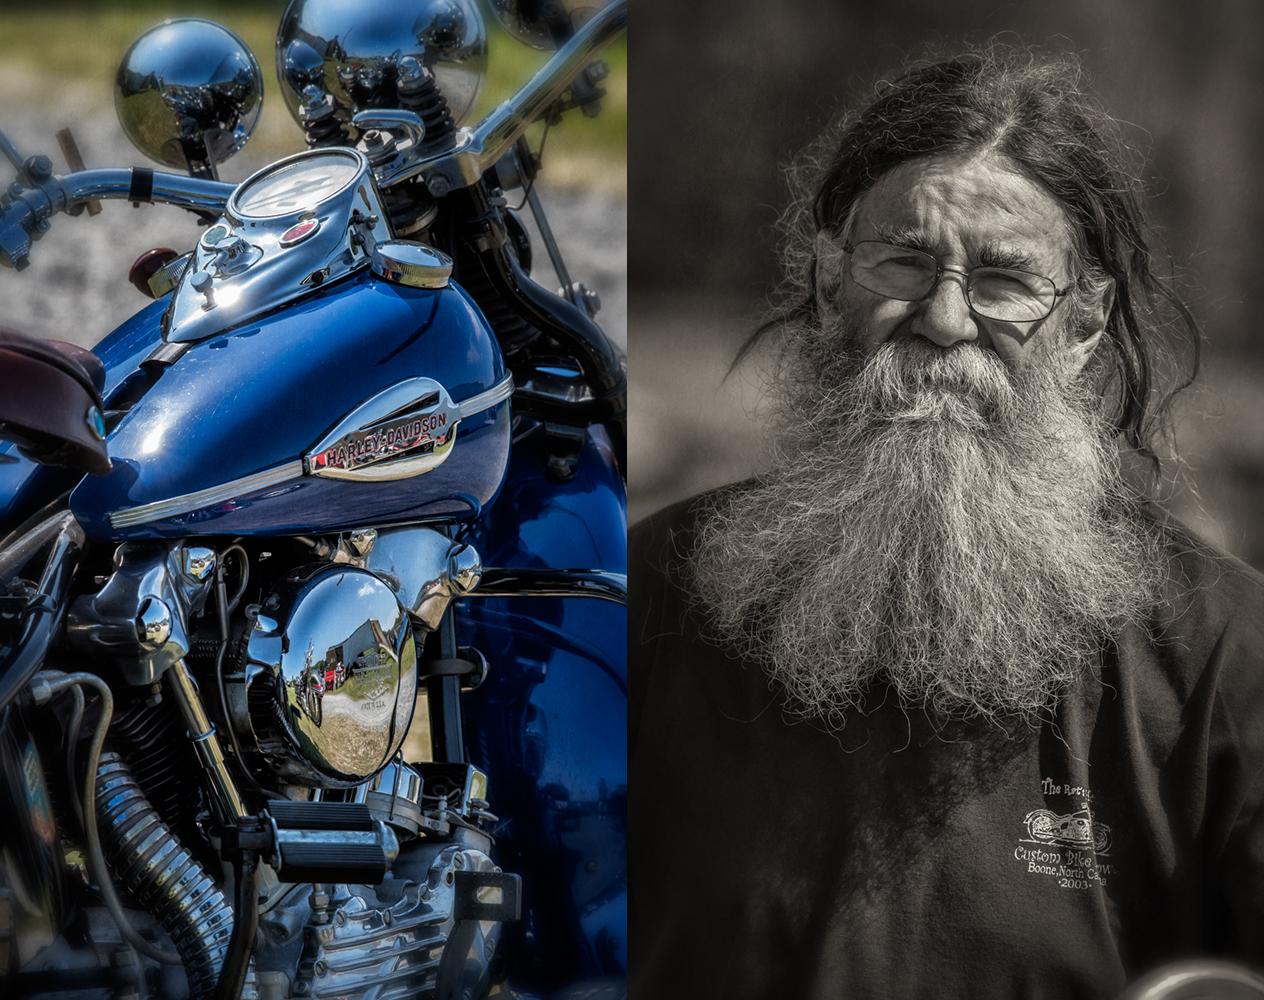 denton_motorcycle meet_2017_group_07